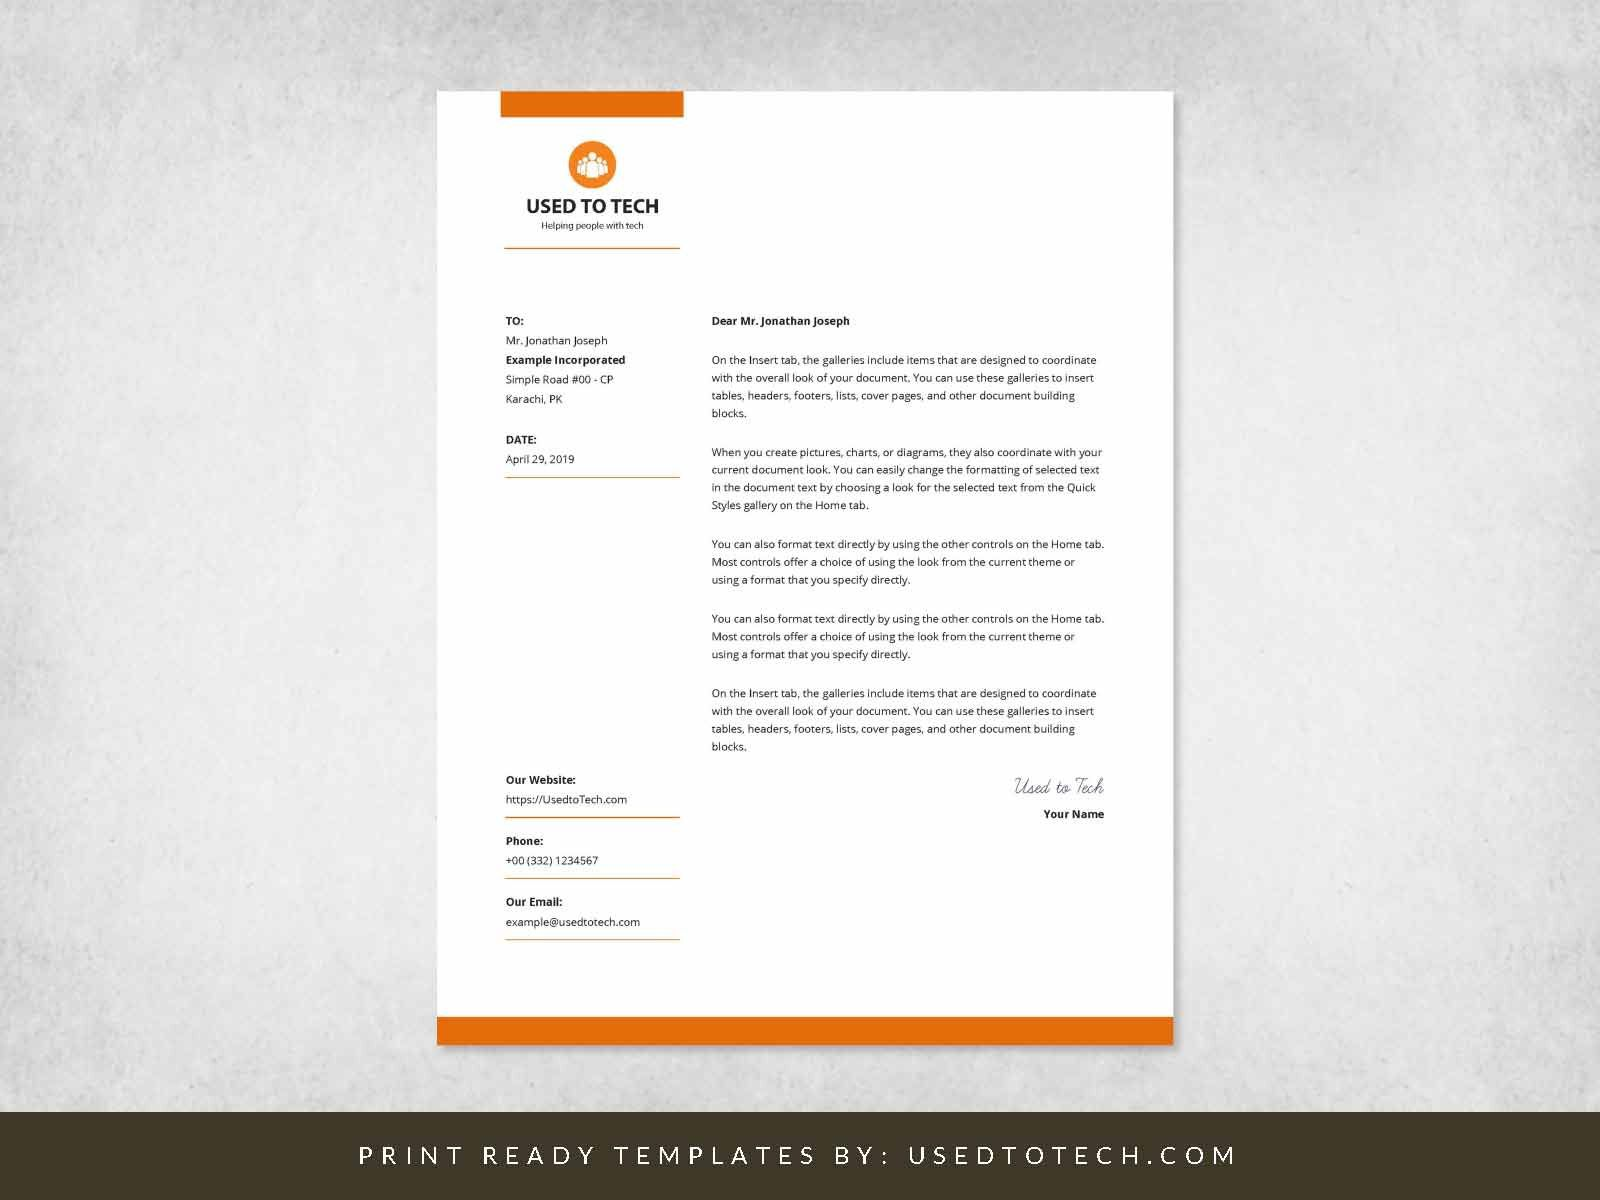 000 Impressive Letterhead Sample Free Download Image  Construction Company TemplateFull